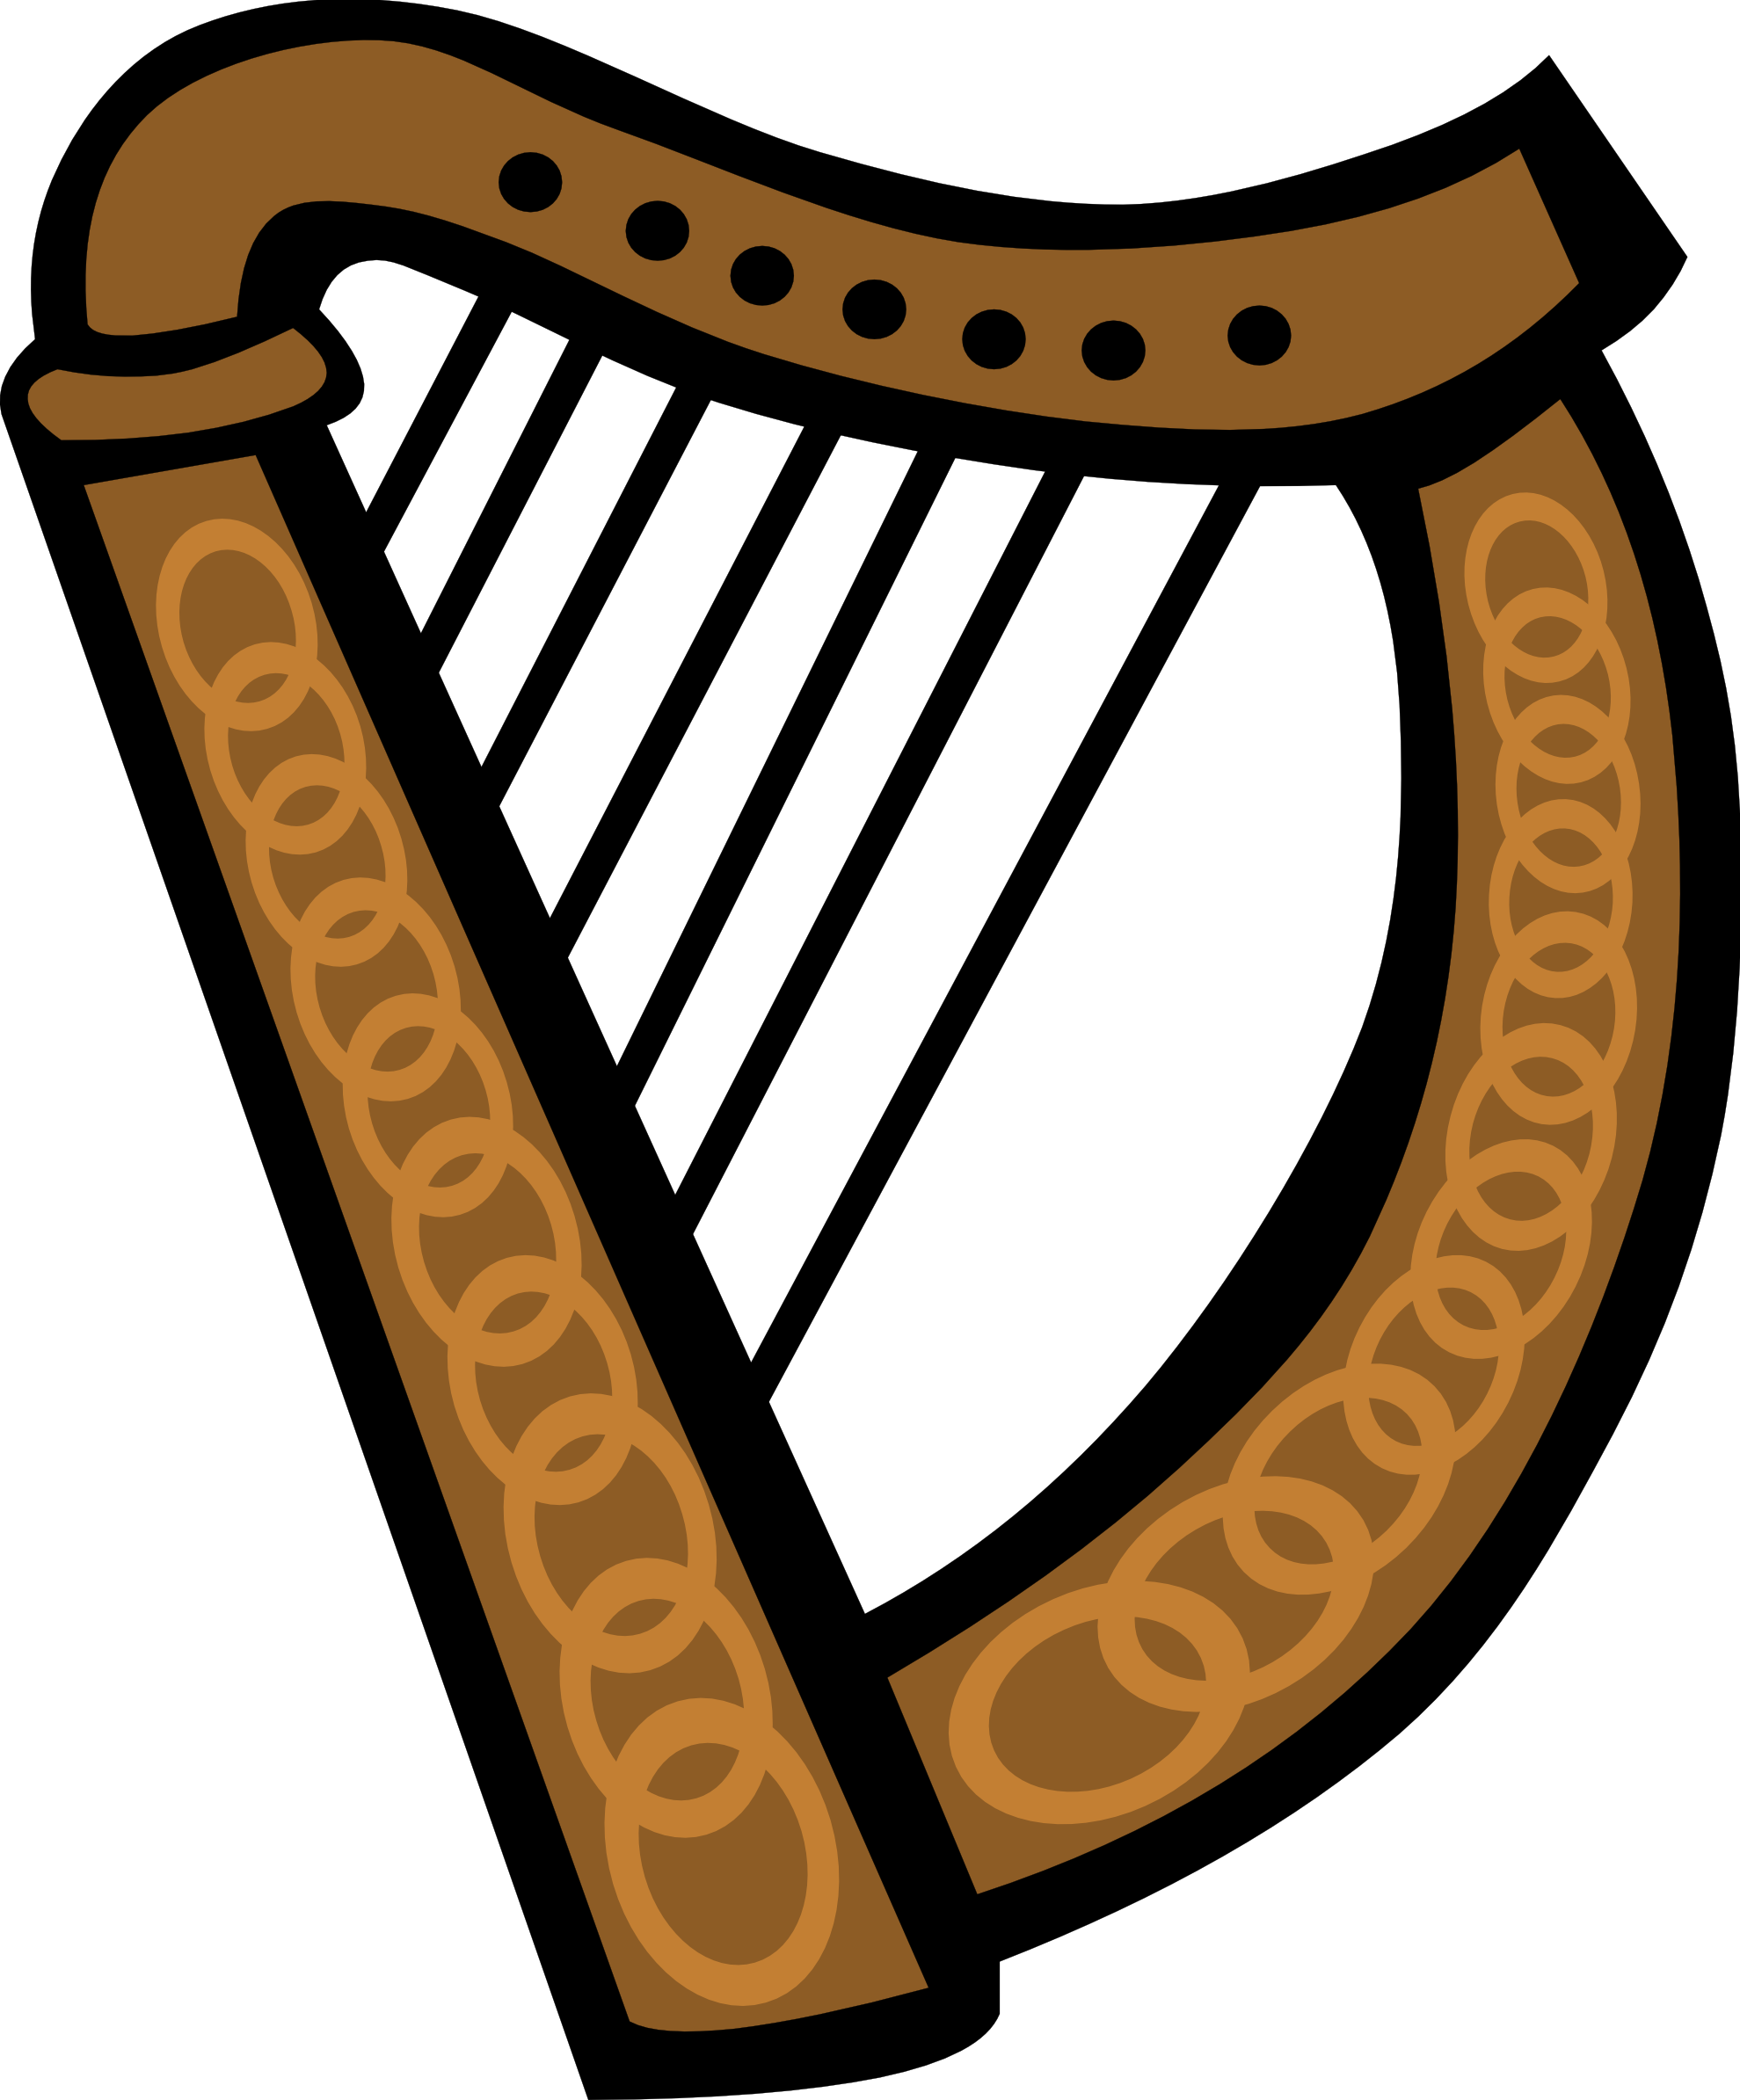 Harp Clipart 3-Harp clipart 3-9